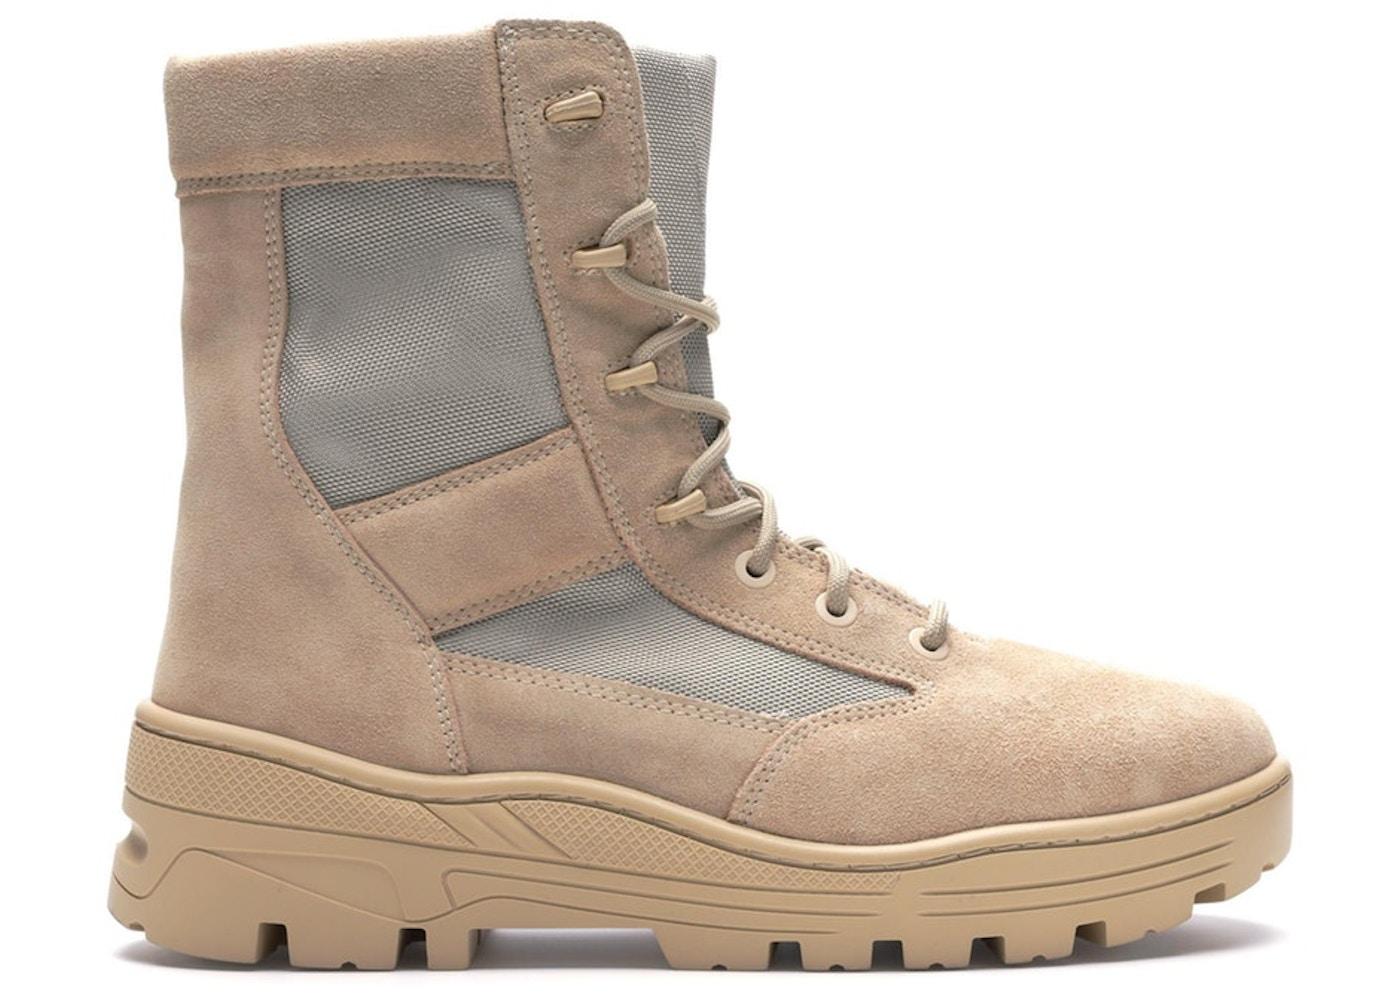 b4b898d01468f Yeezy Combat Boot Season 4 Sand - KM3605-115